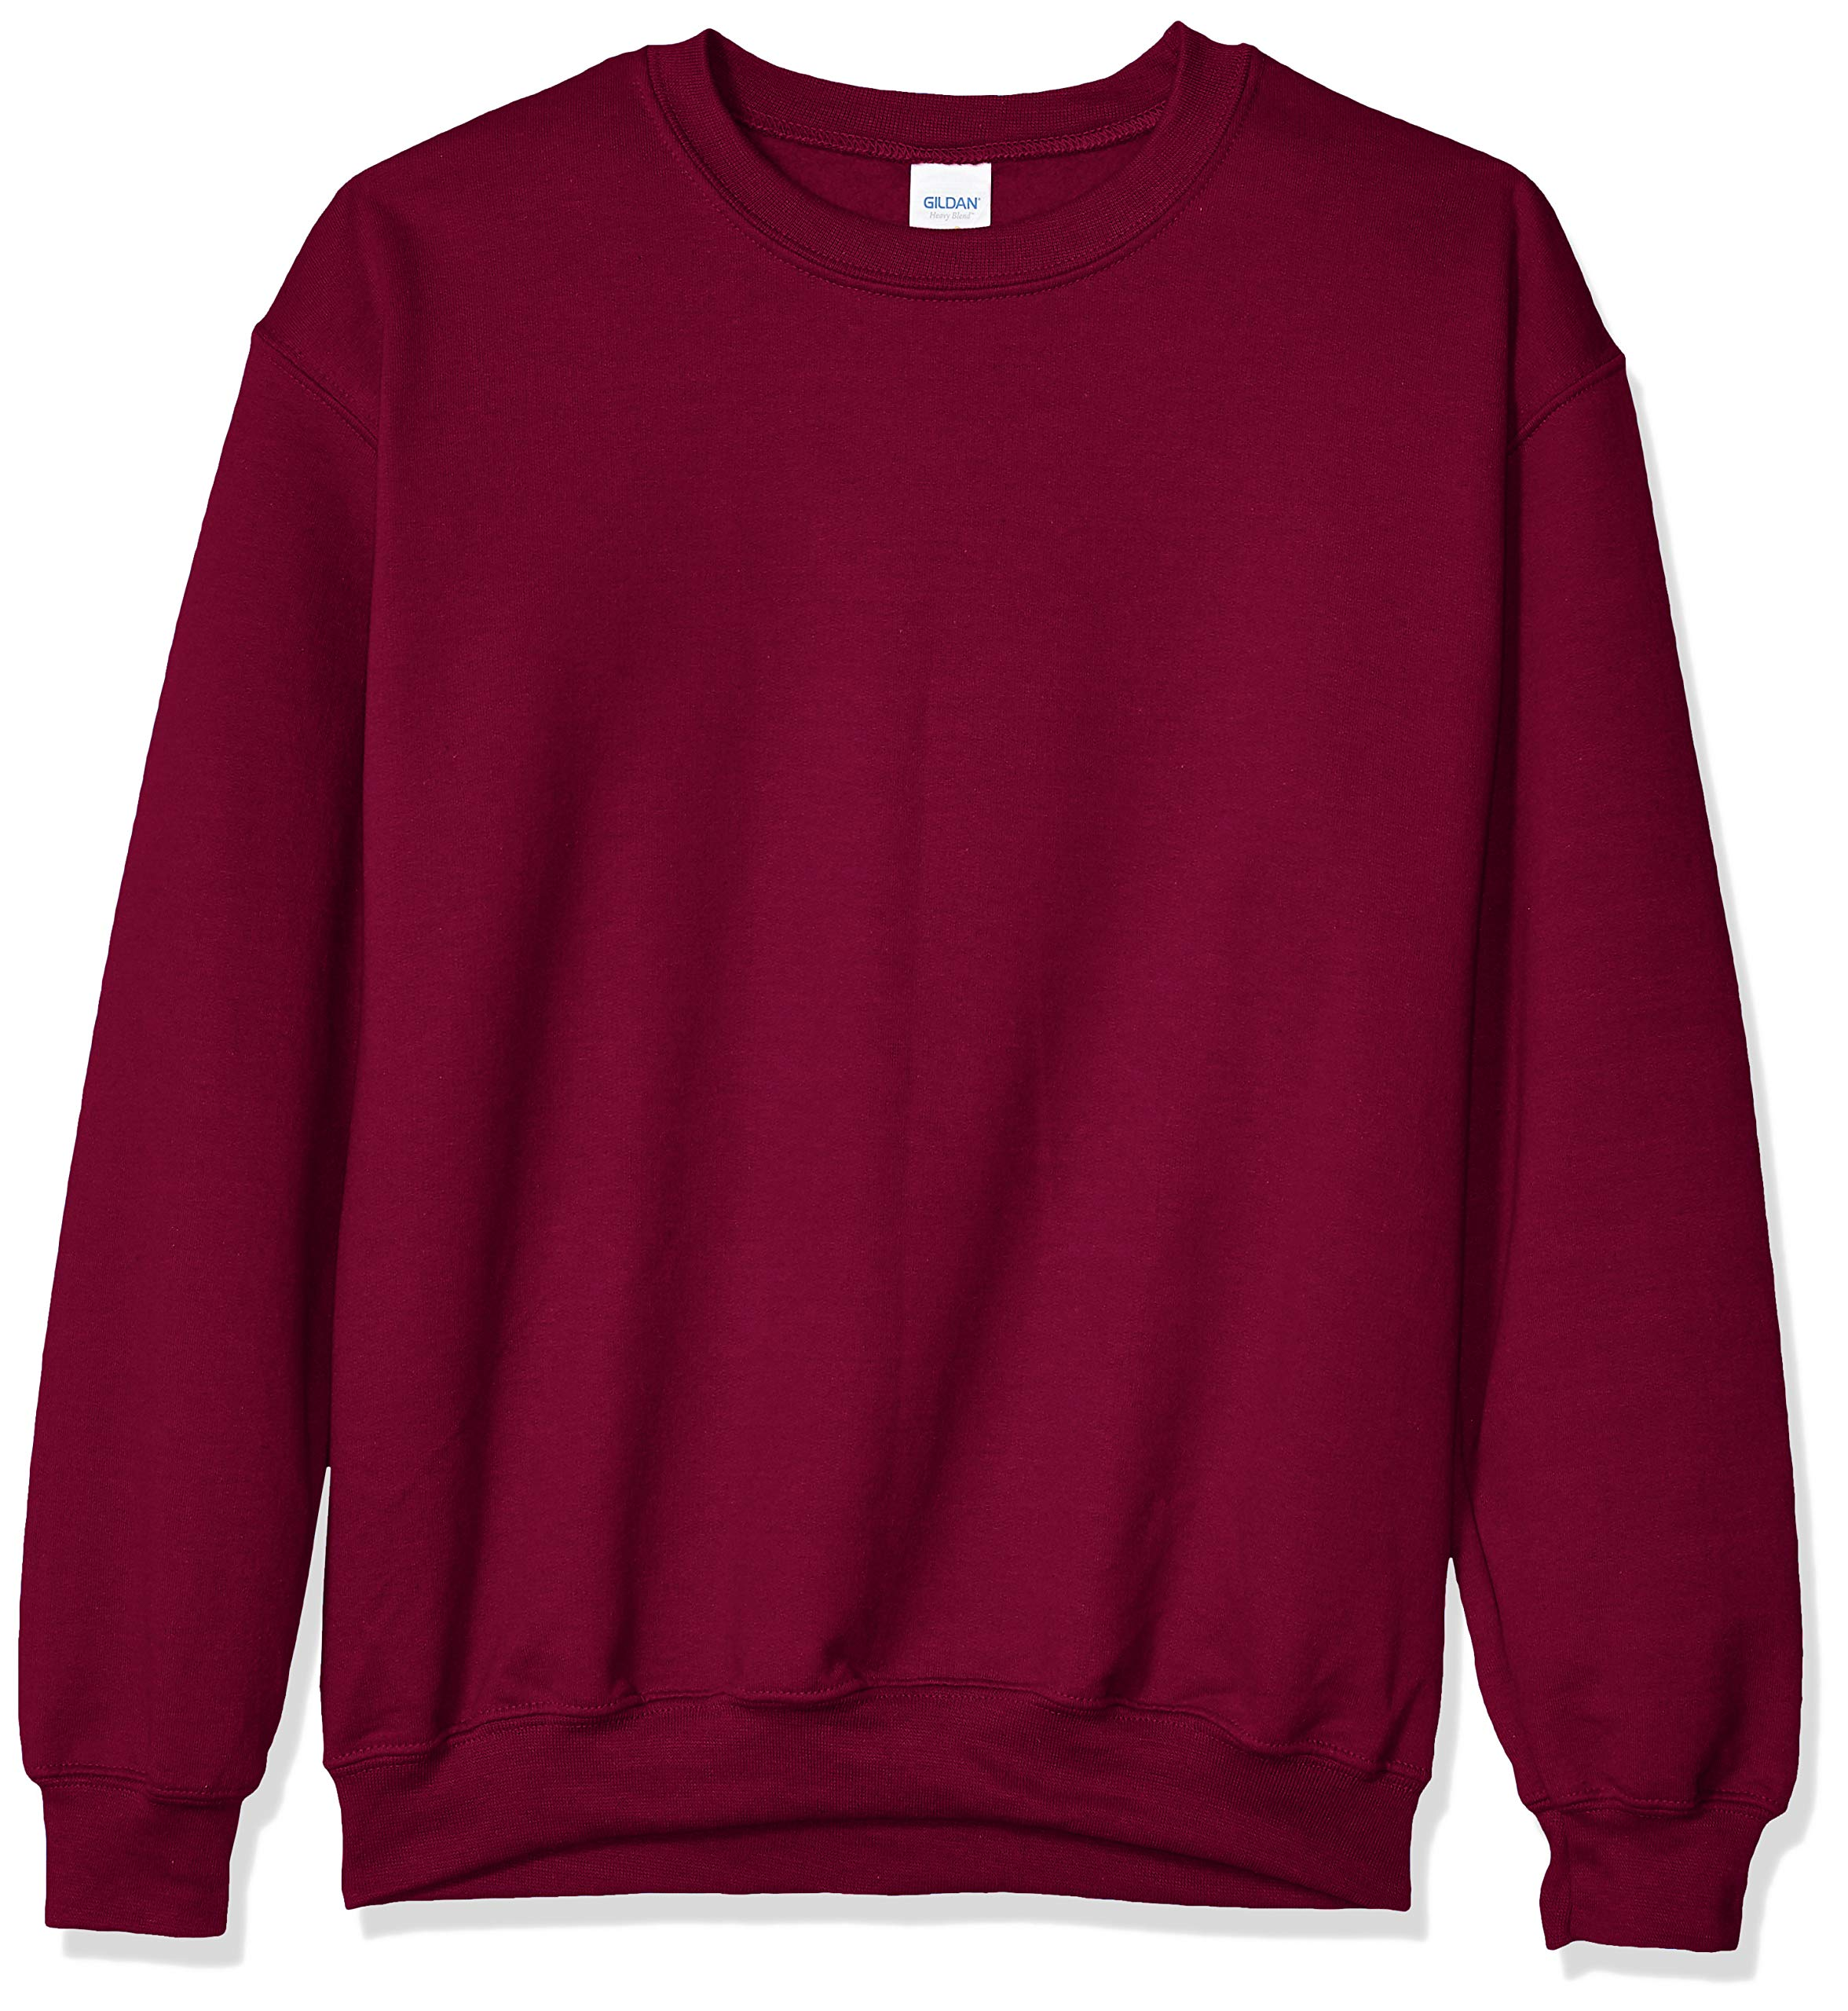 Gildan Men's Fleece Crewneck Sweatshirt, Maroon, 3X-Large by Gildan